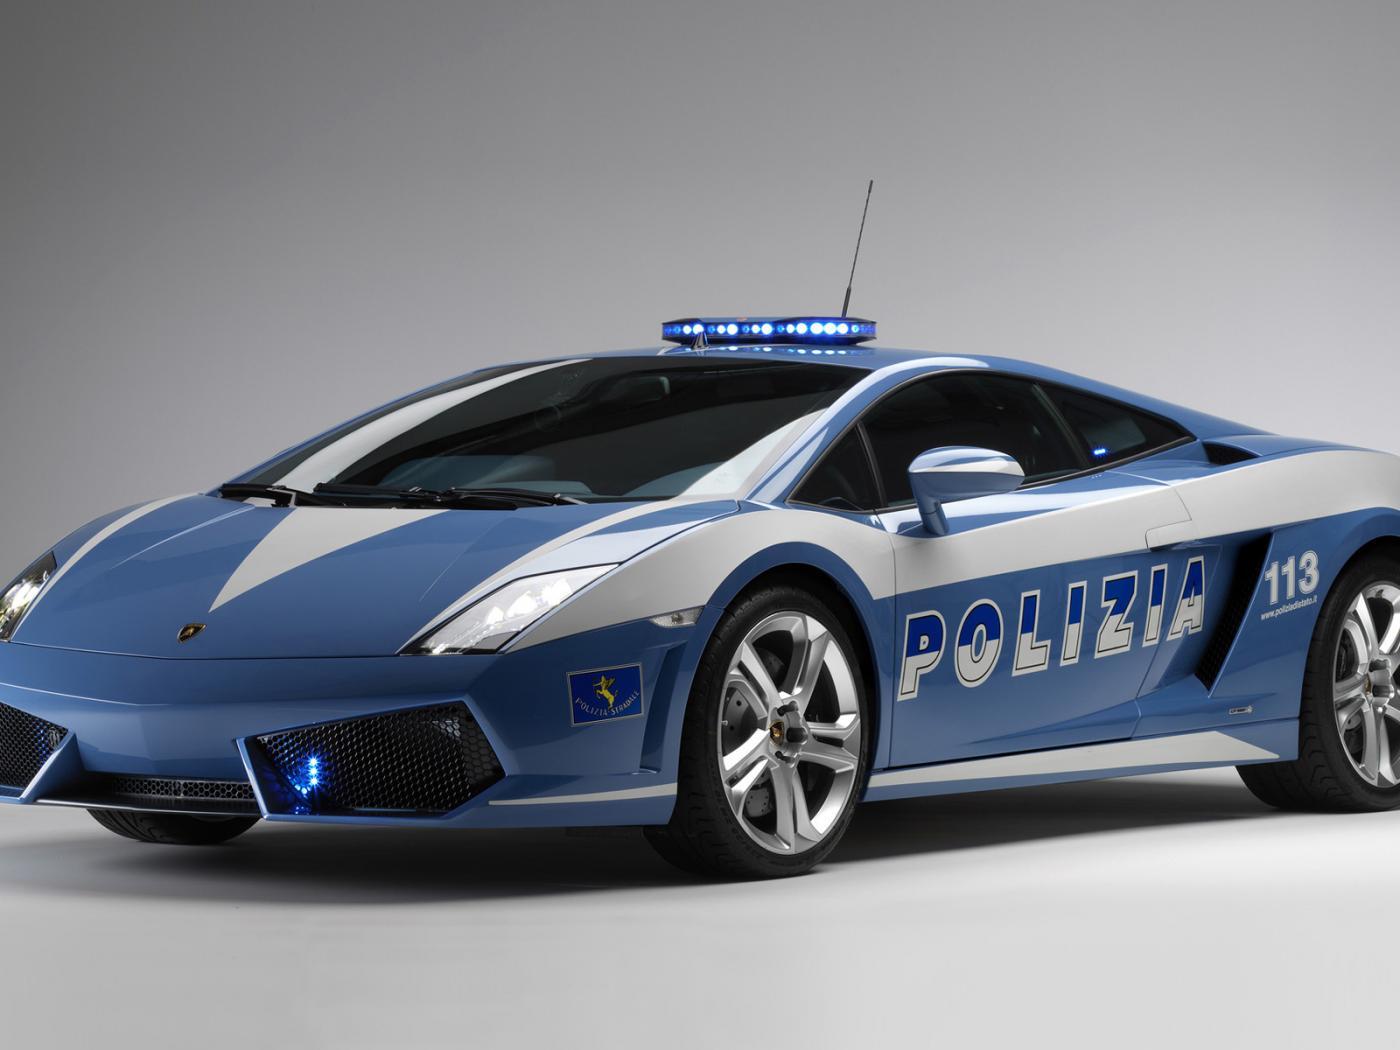 Police Wallpaper Cars police lamborghini 1400x1050